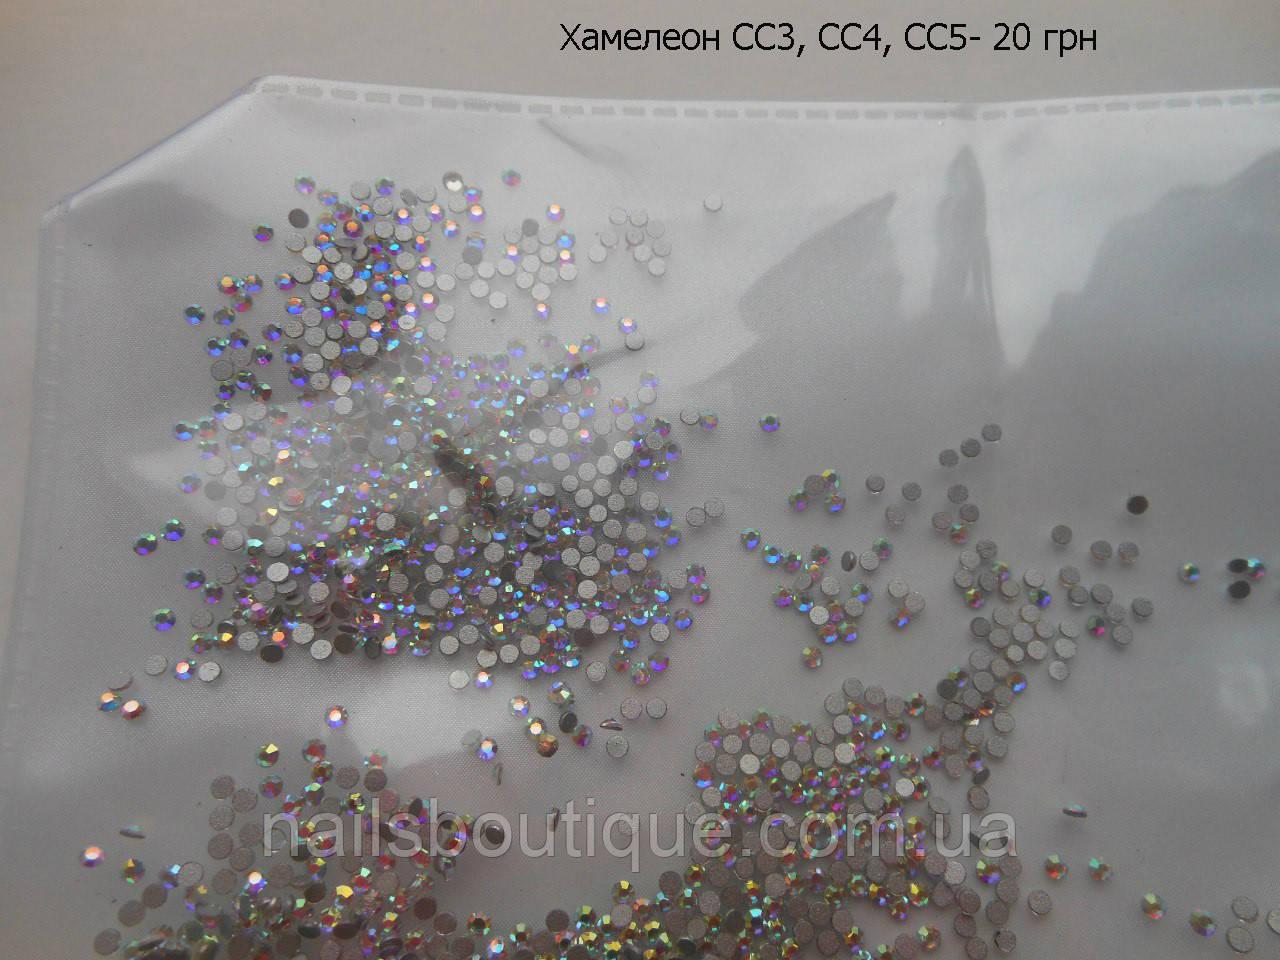 Стразы хамелеон, стекло, размер СС3 (1,2мм), 100шт